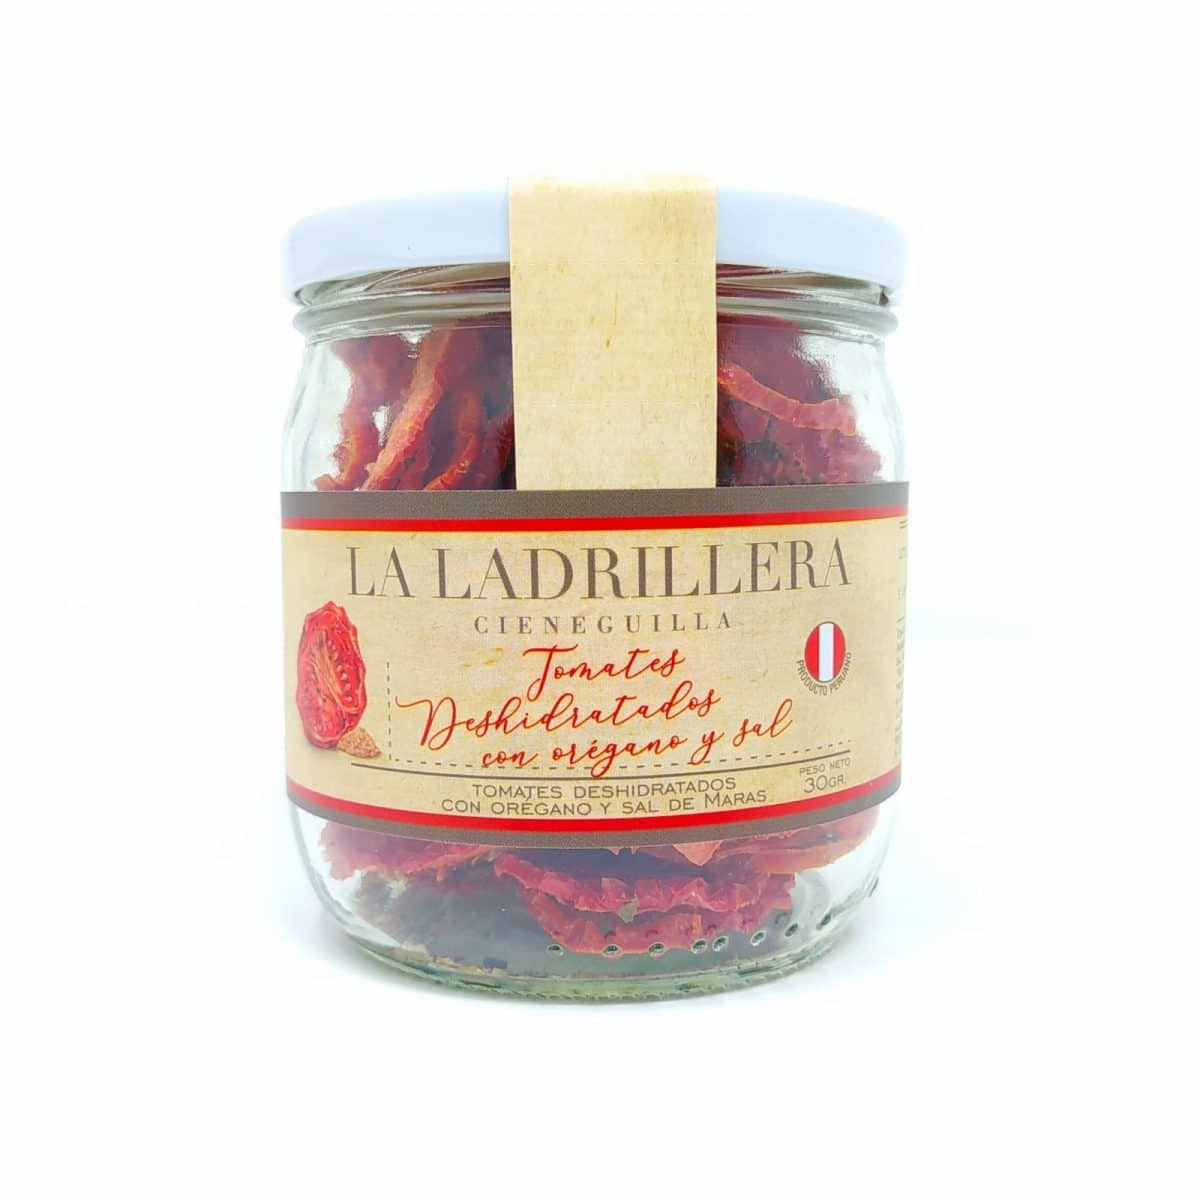 tomate deshidratado con oregano y sal